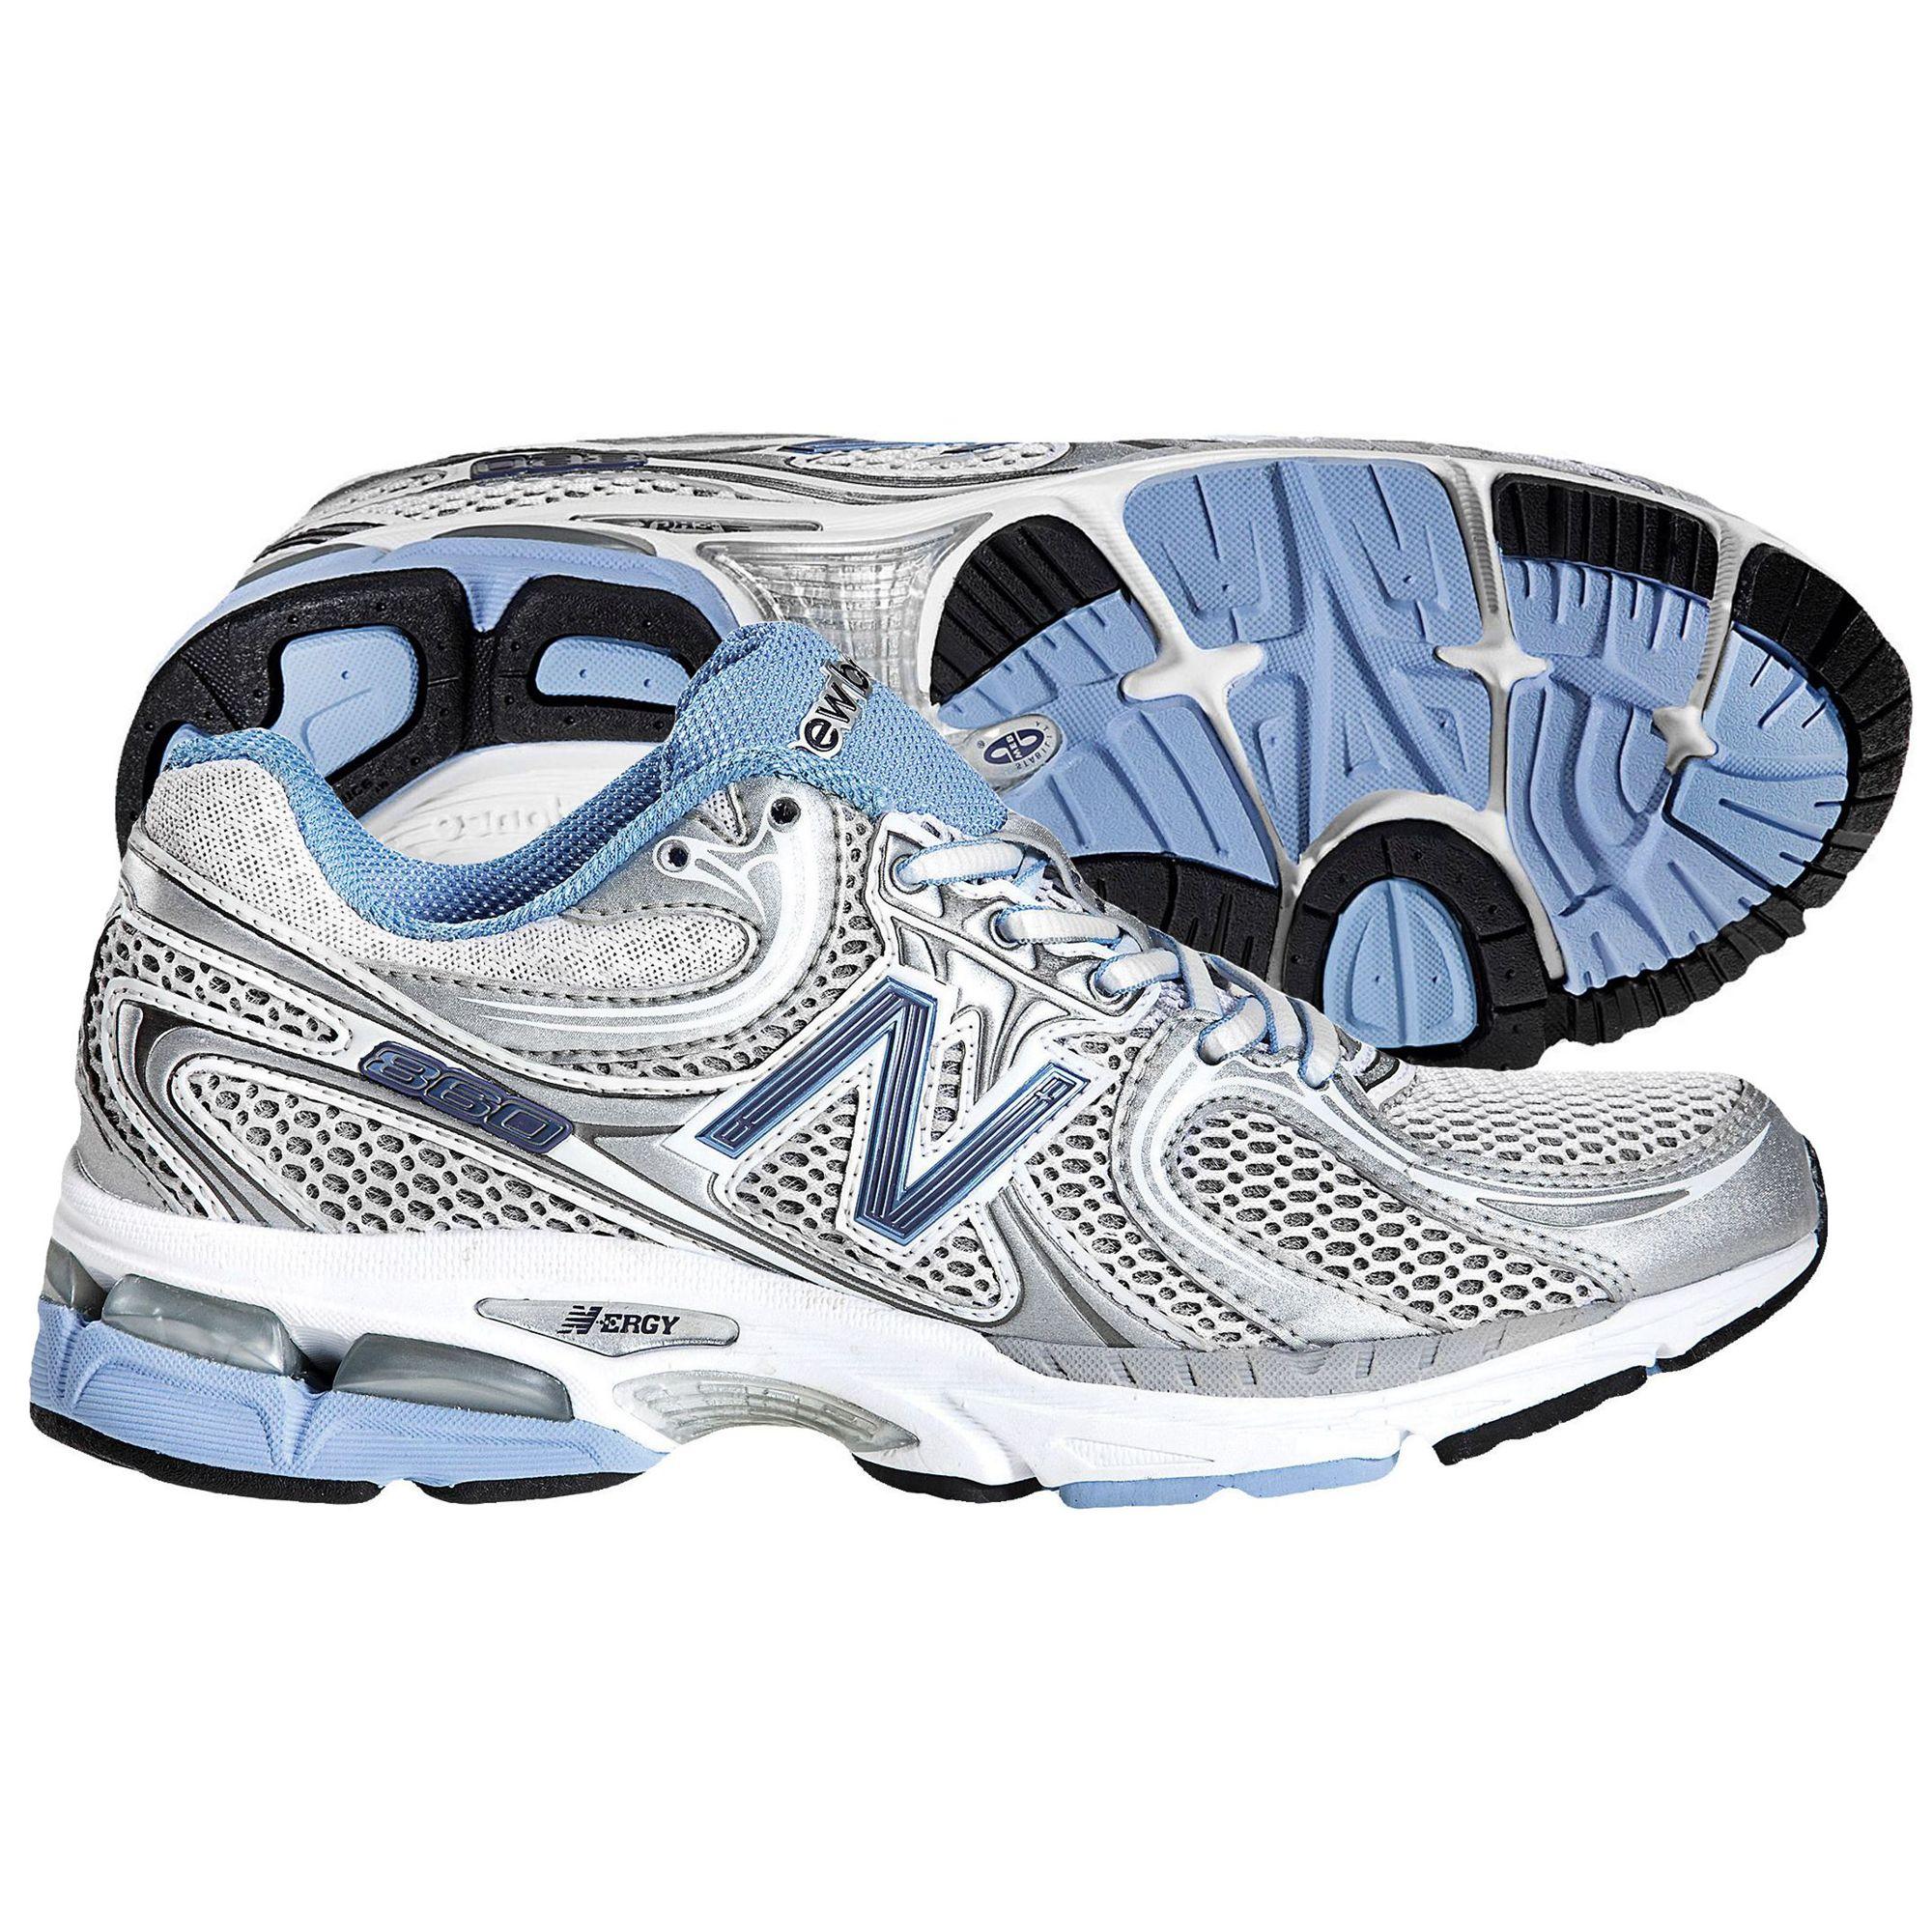 New Balance 860 NBX Womens Running Shoes